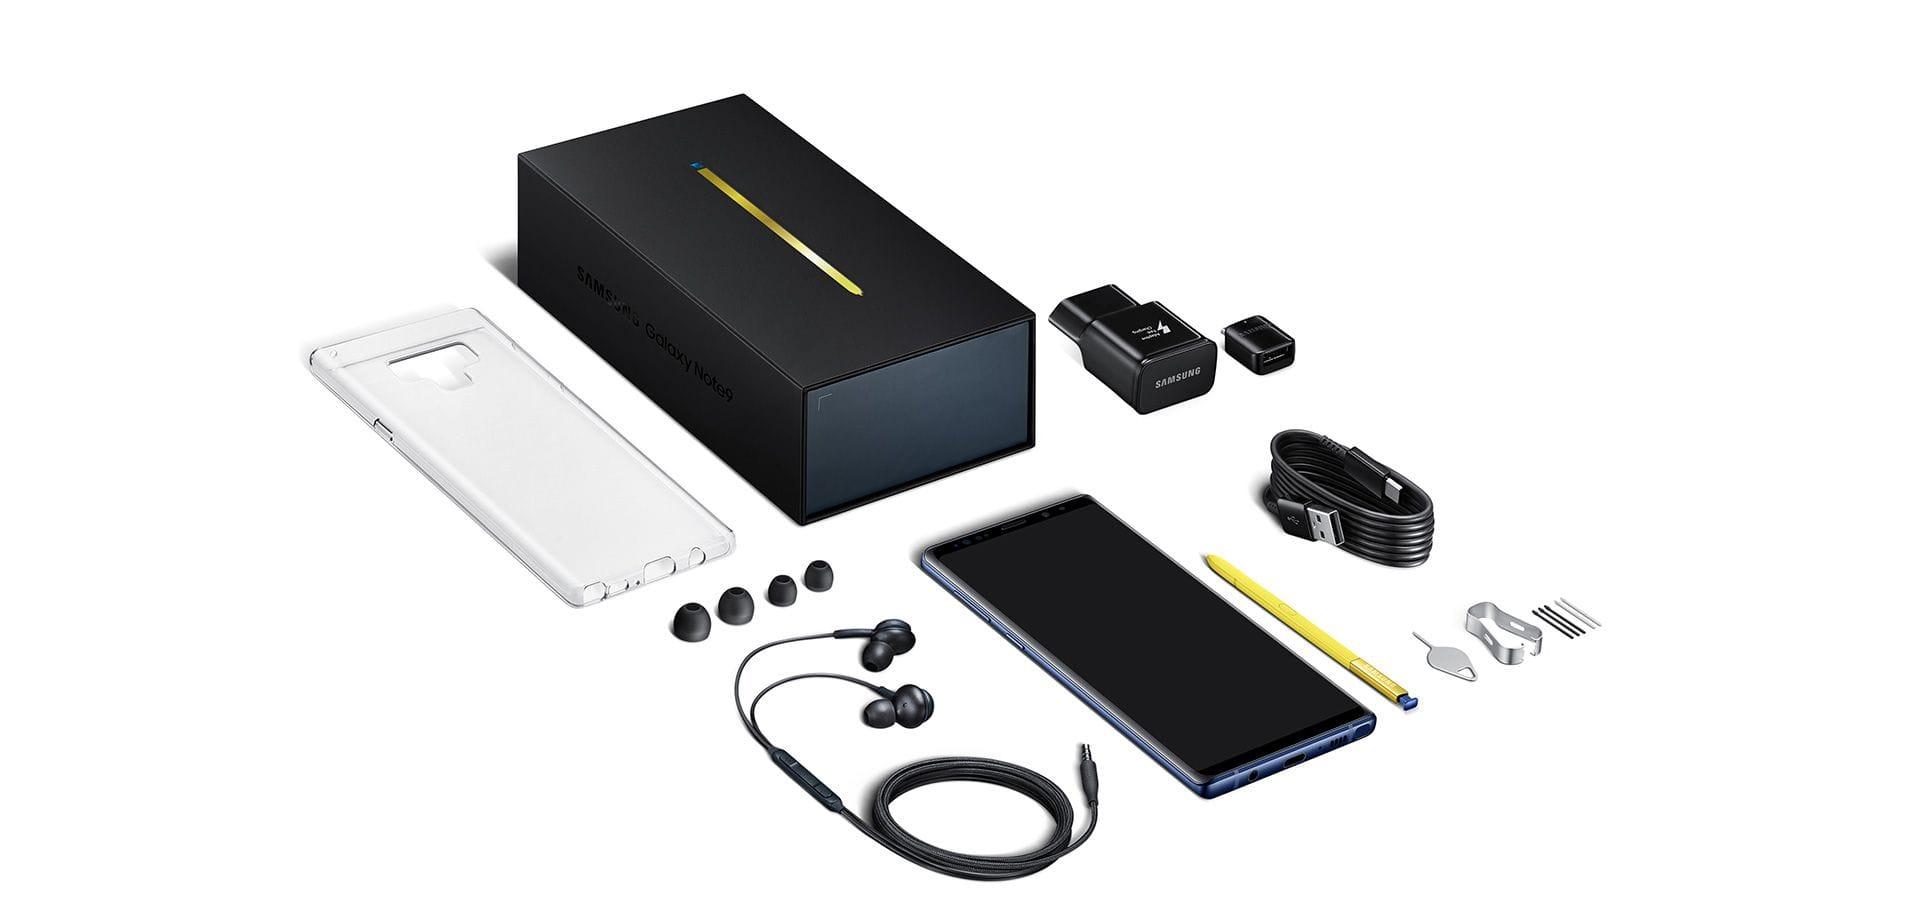 Samsung Galaxy Note9 packaging